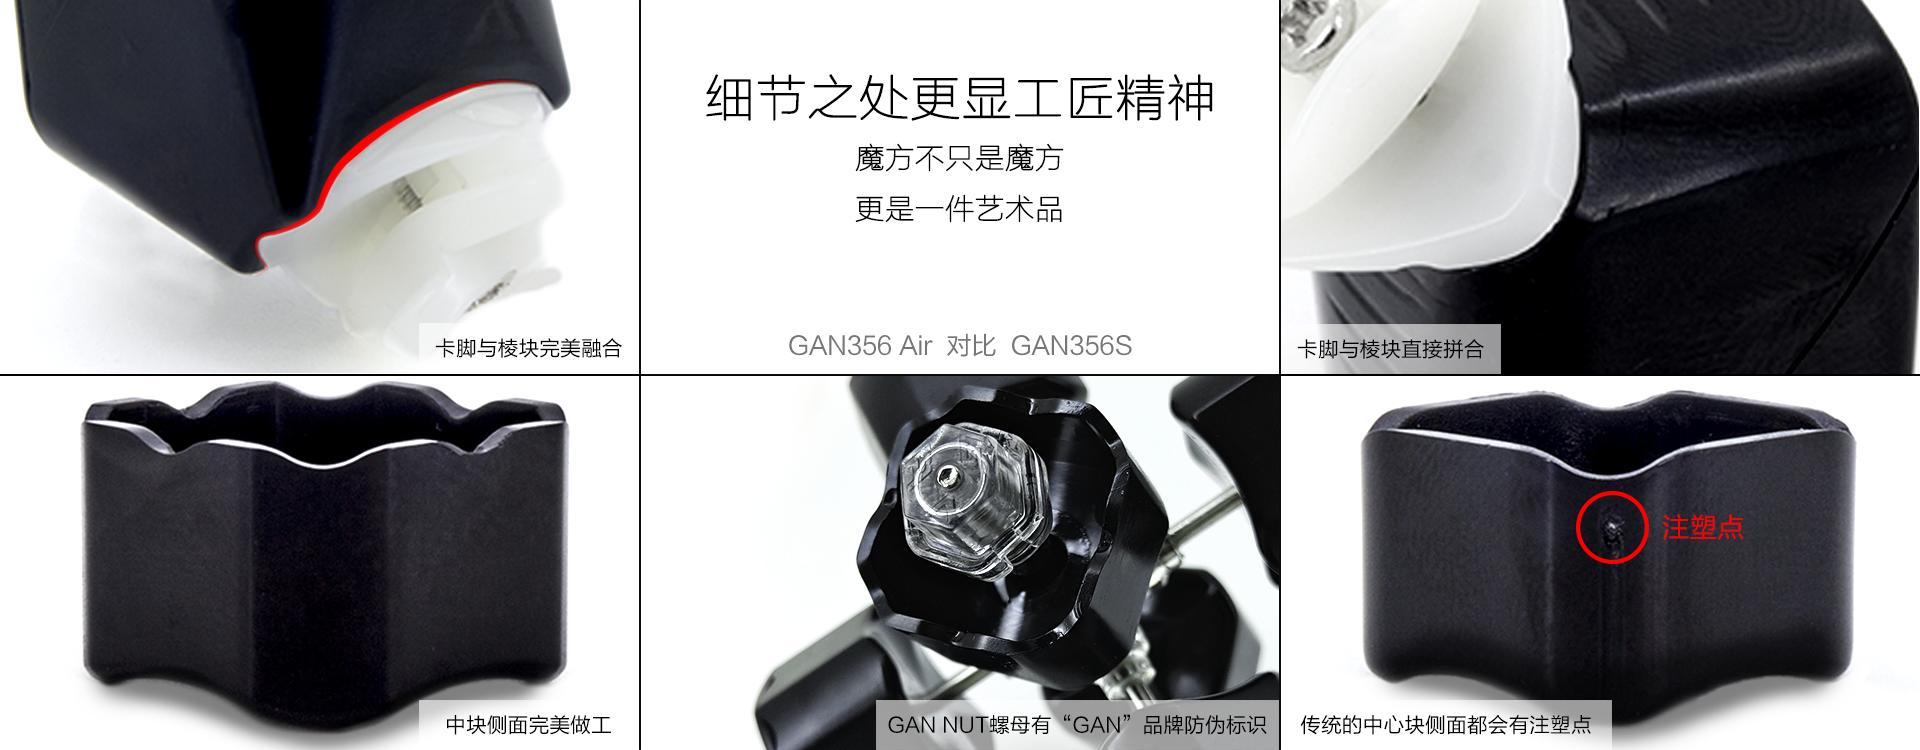 GAN356-Air-图文详情二_09